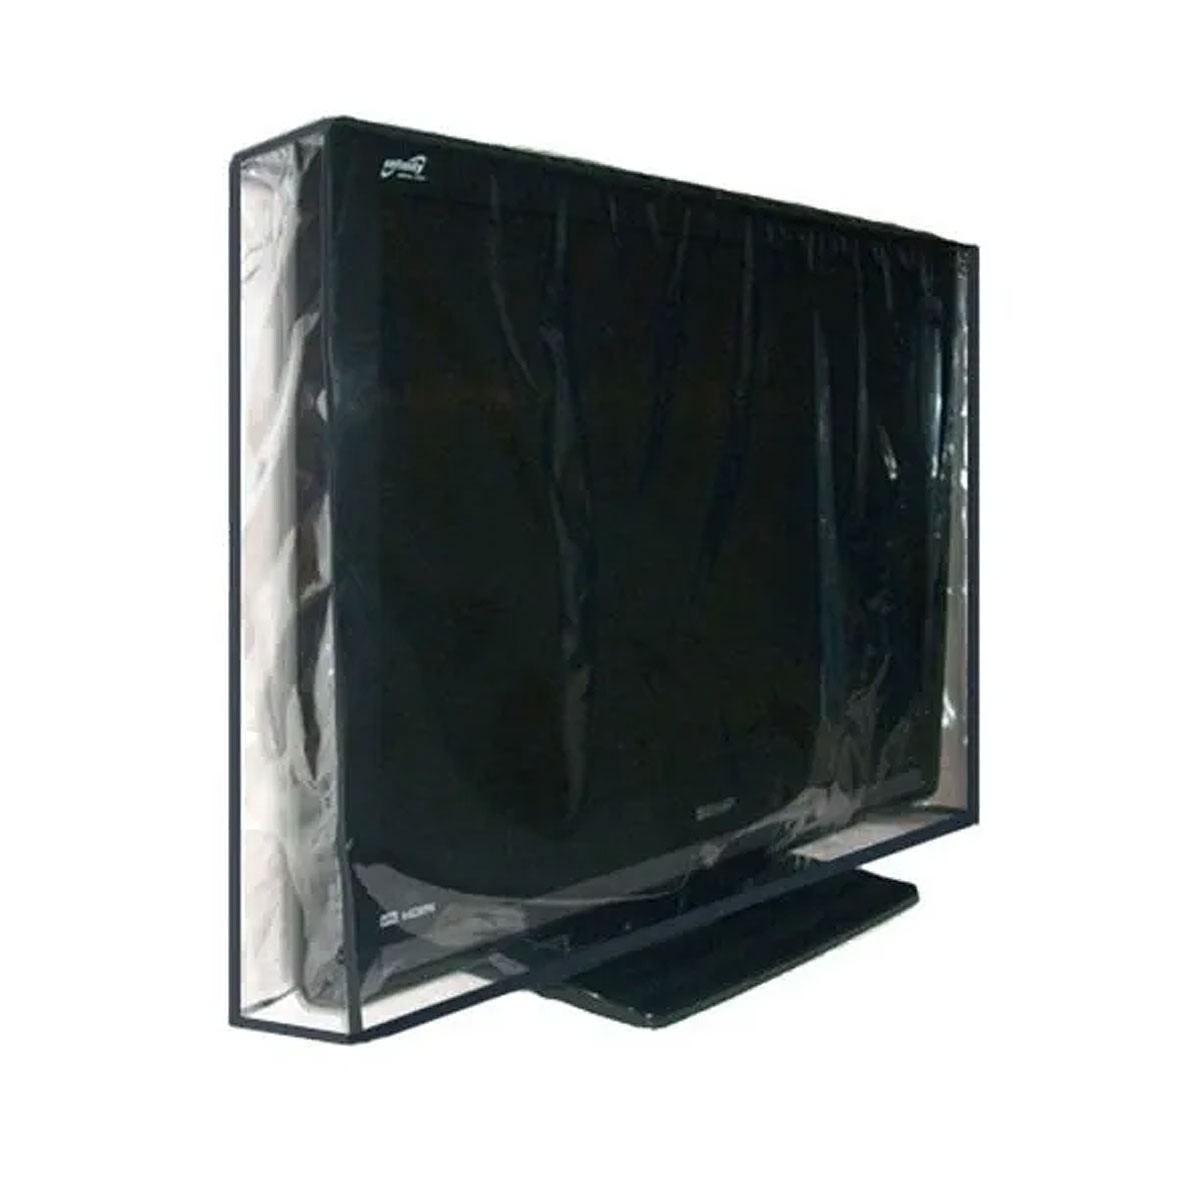 Capa Para Tv Lcd 55 Pvc Cristal - Fechada Atrás